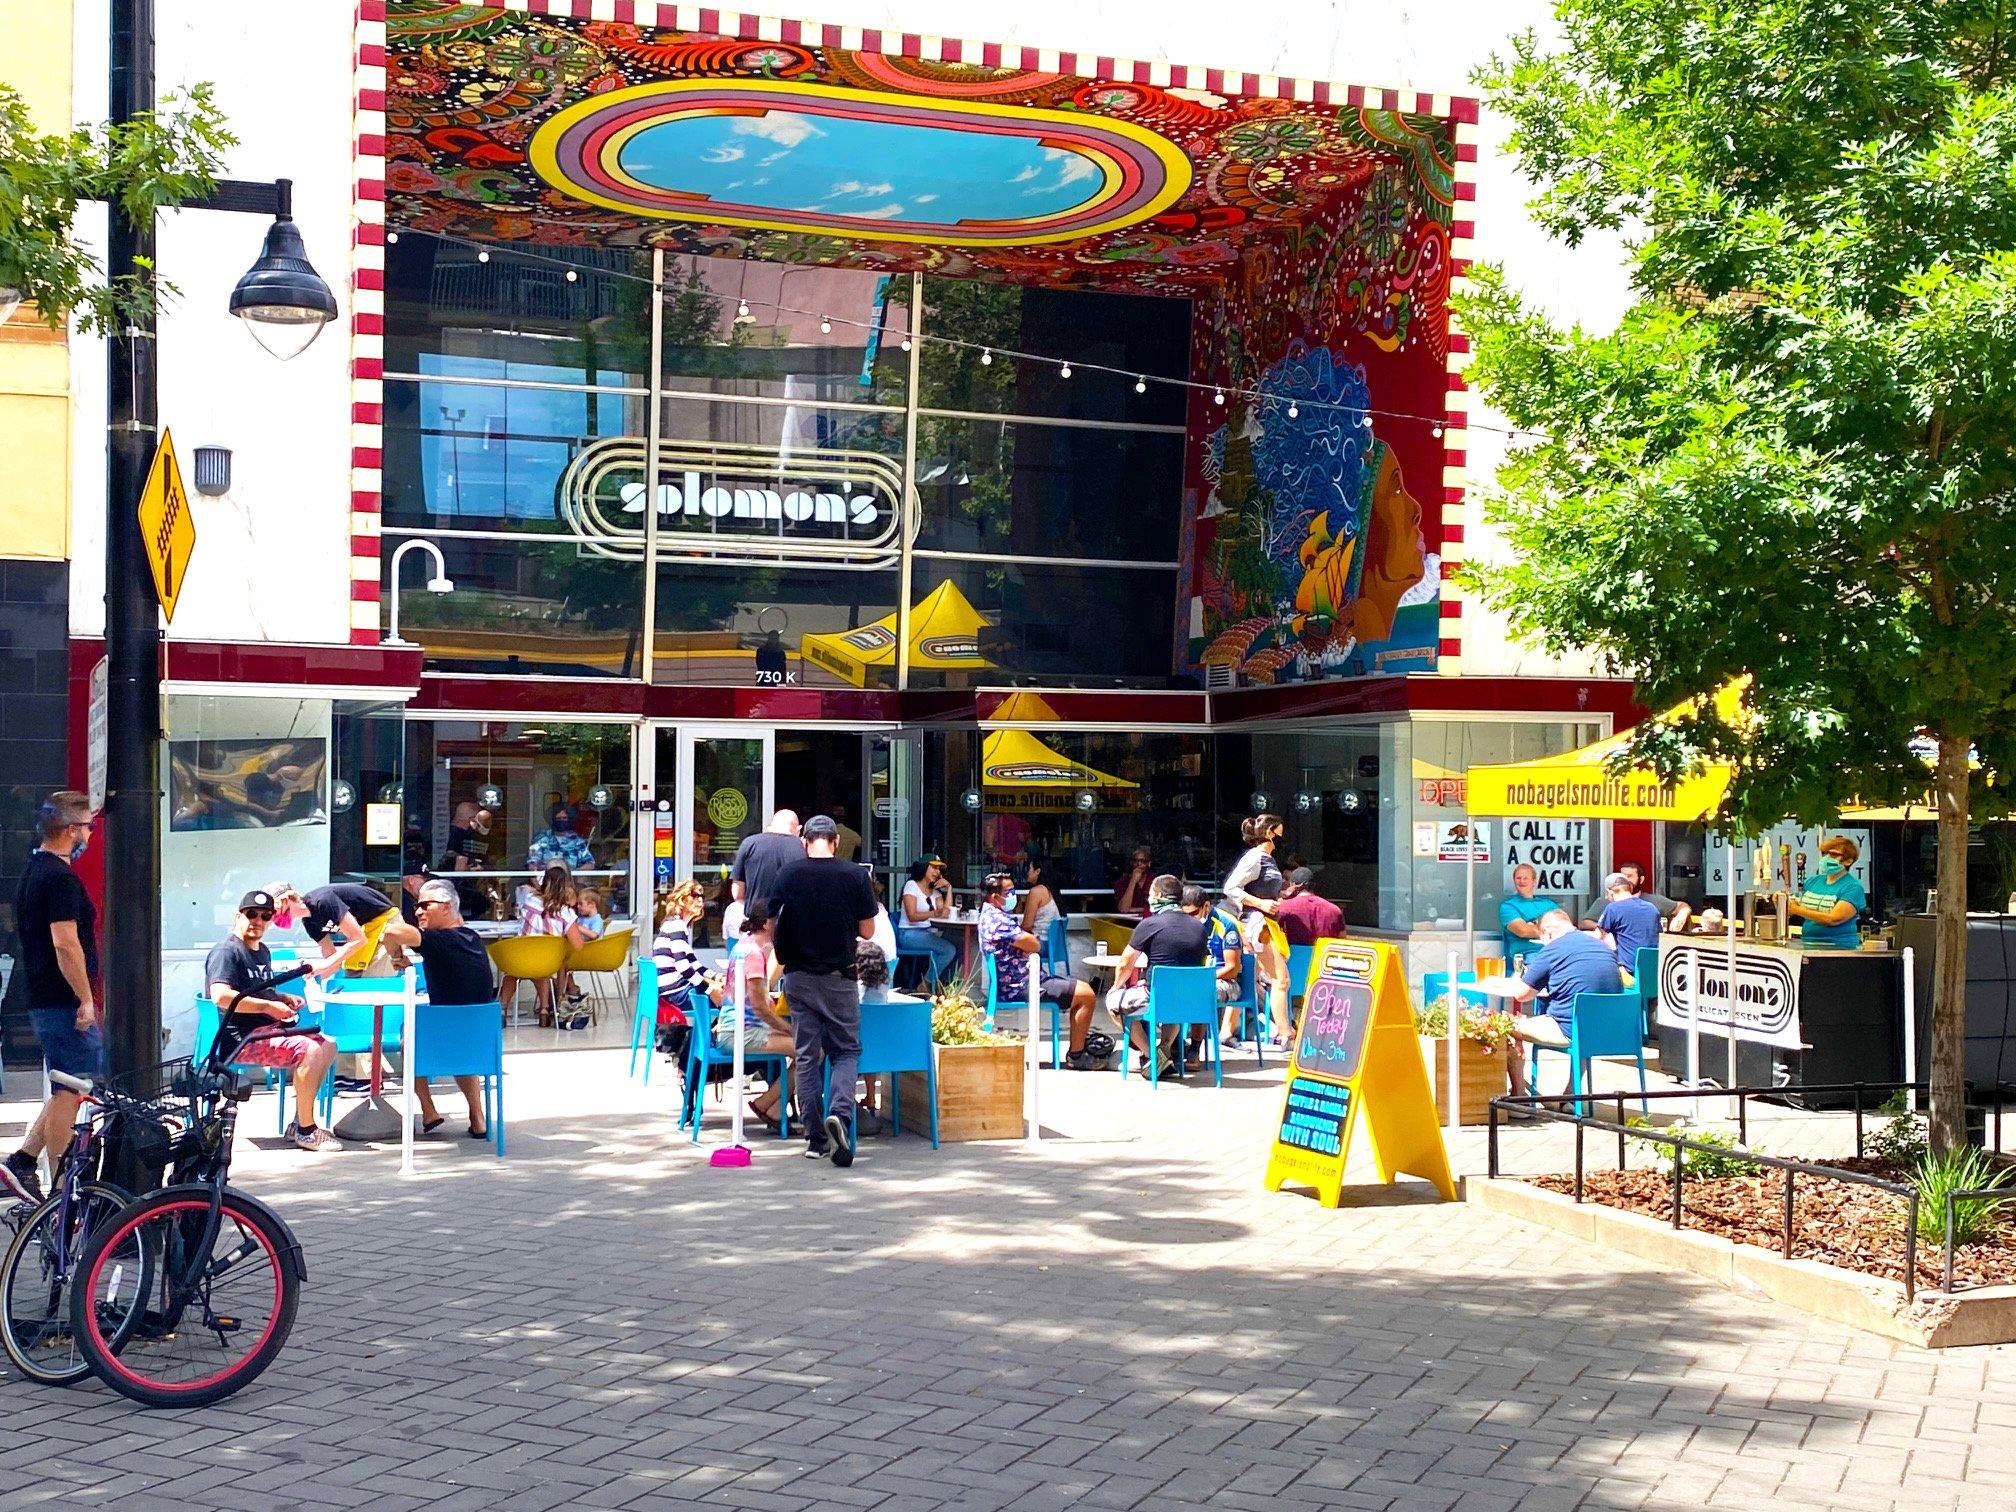 Downtown Sacramento Partnership Offers ReImagine Activation Micro-Grants to Inspire Artistic Ideas via @sacramentopress